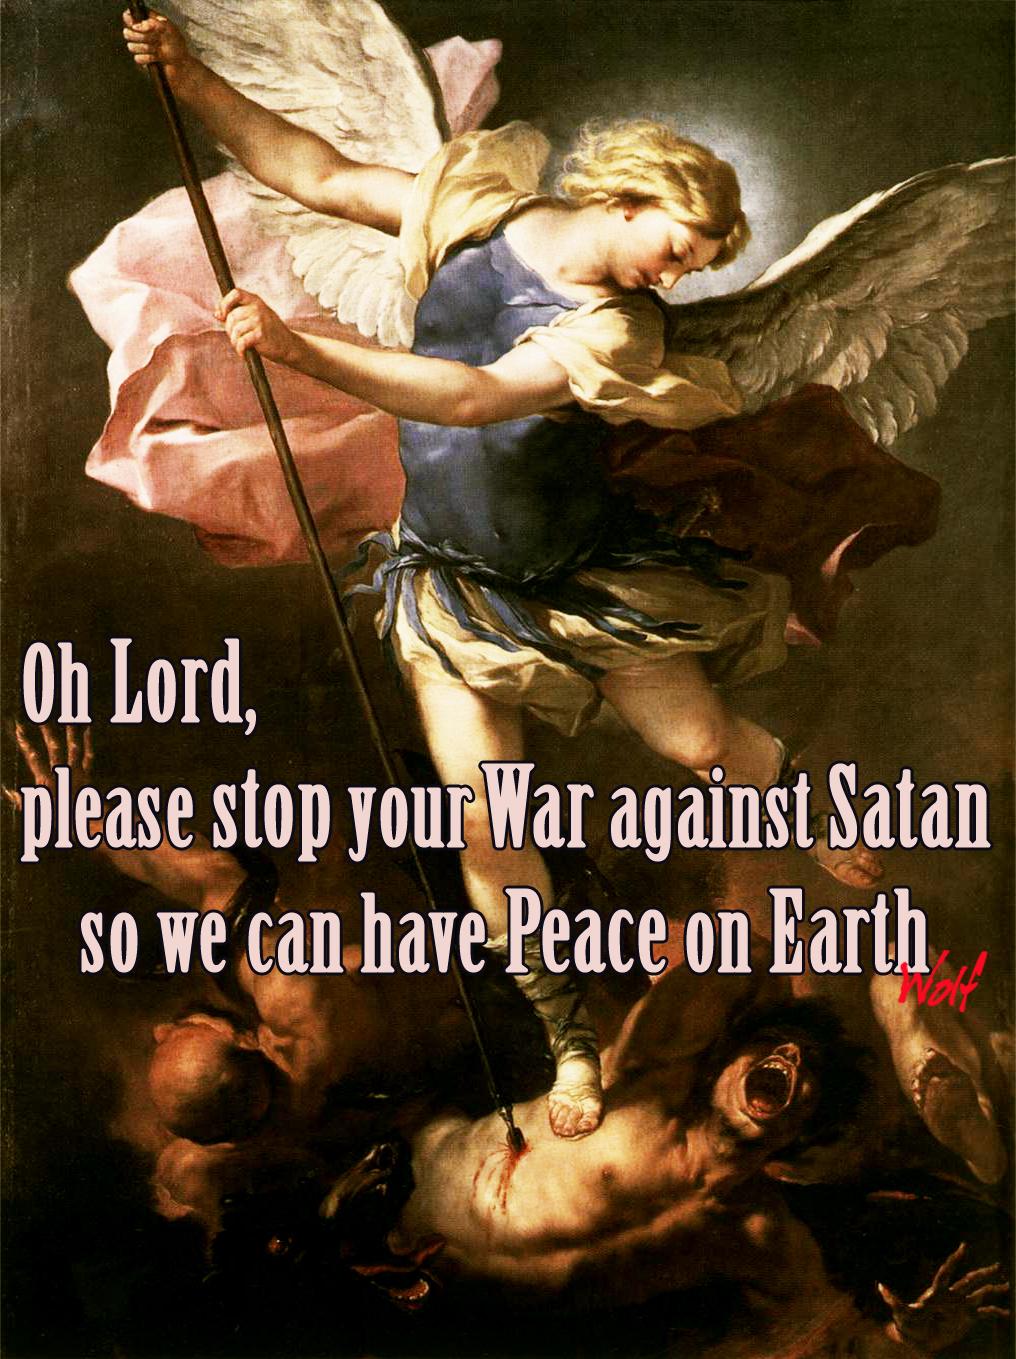 St-Michael fighting Satan